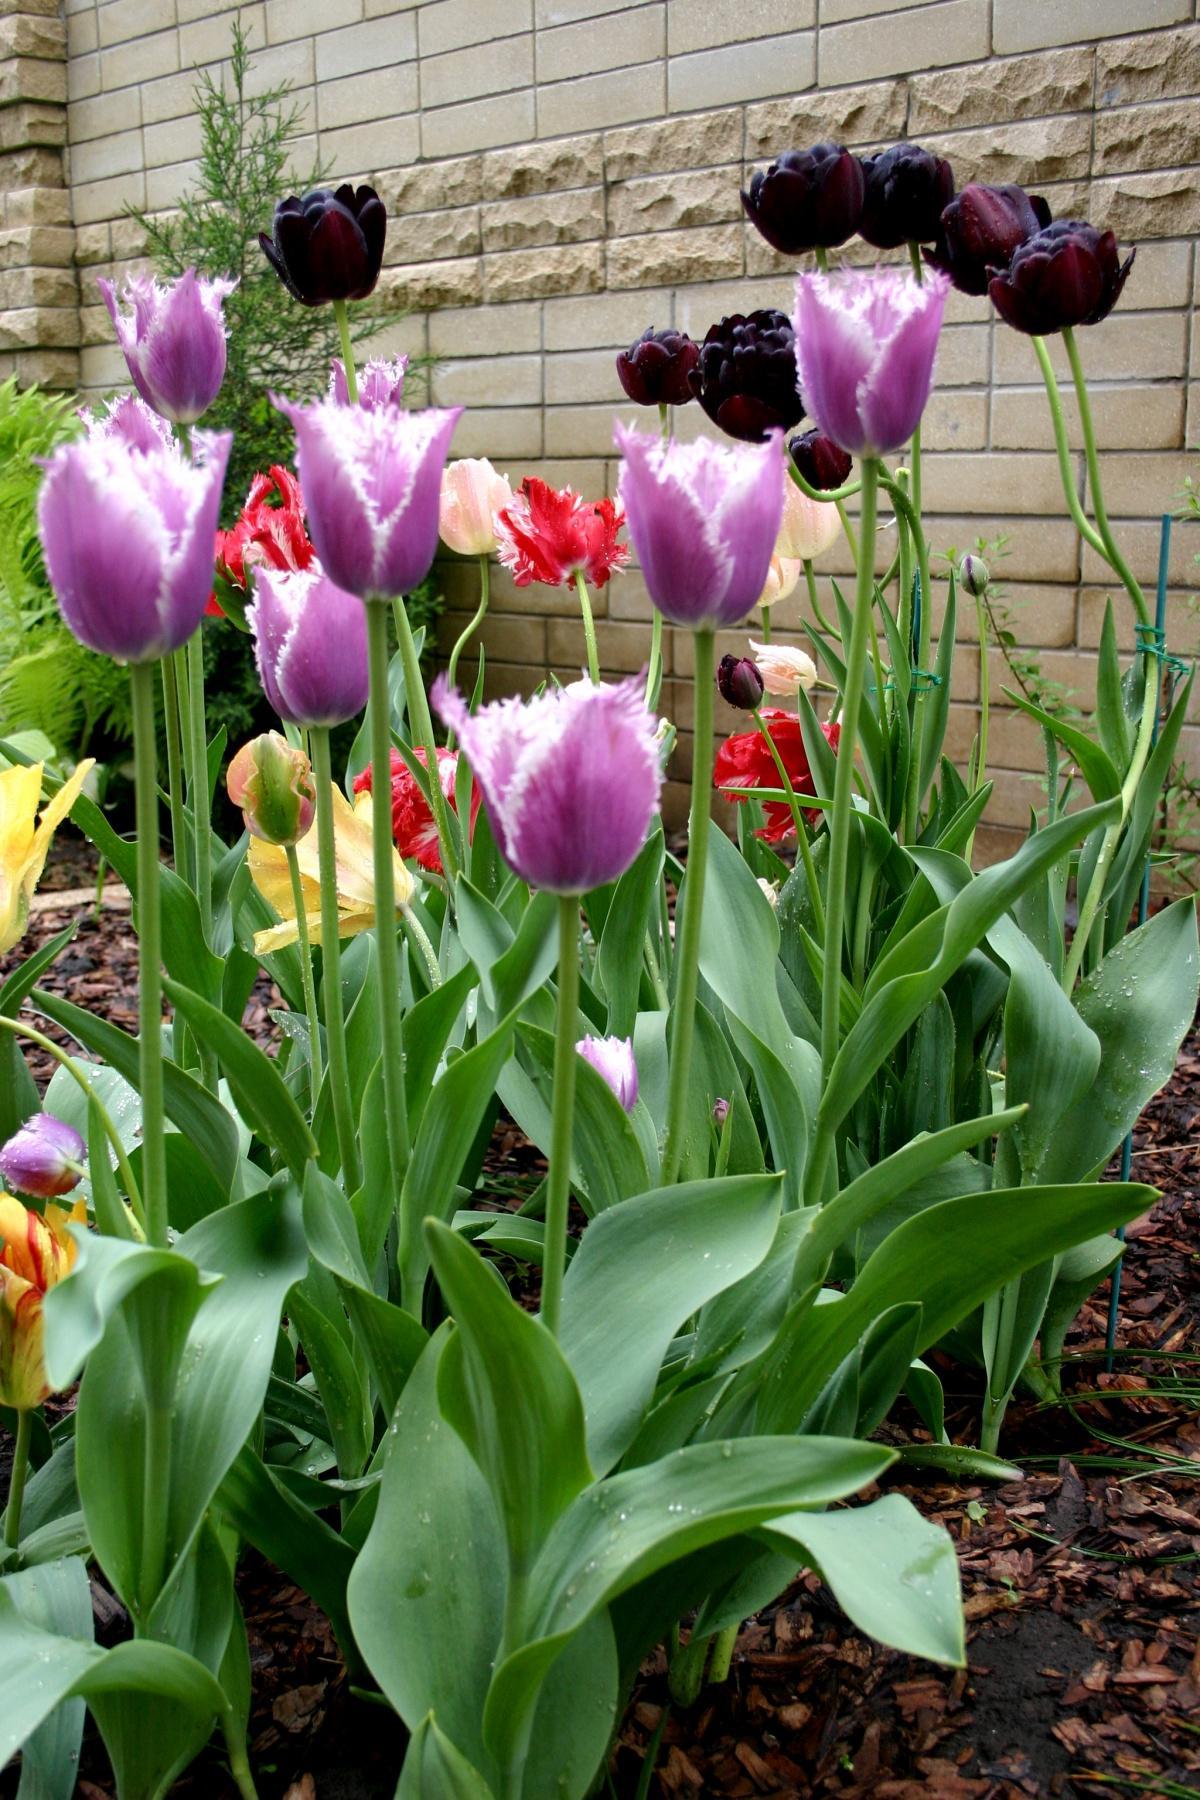 Tulips and Art Nouveau